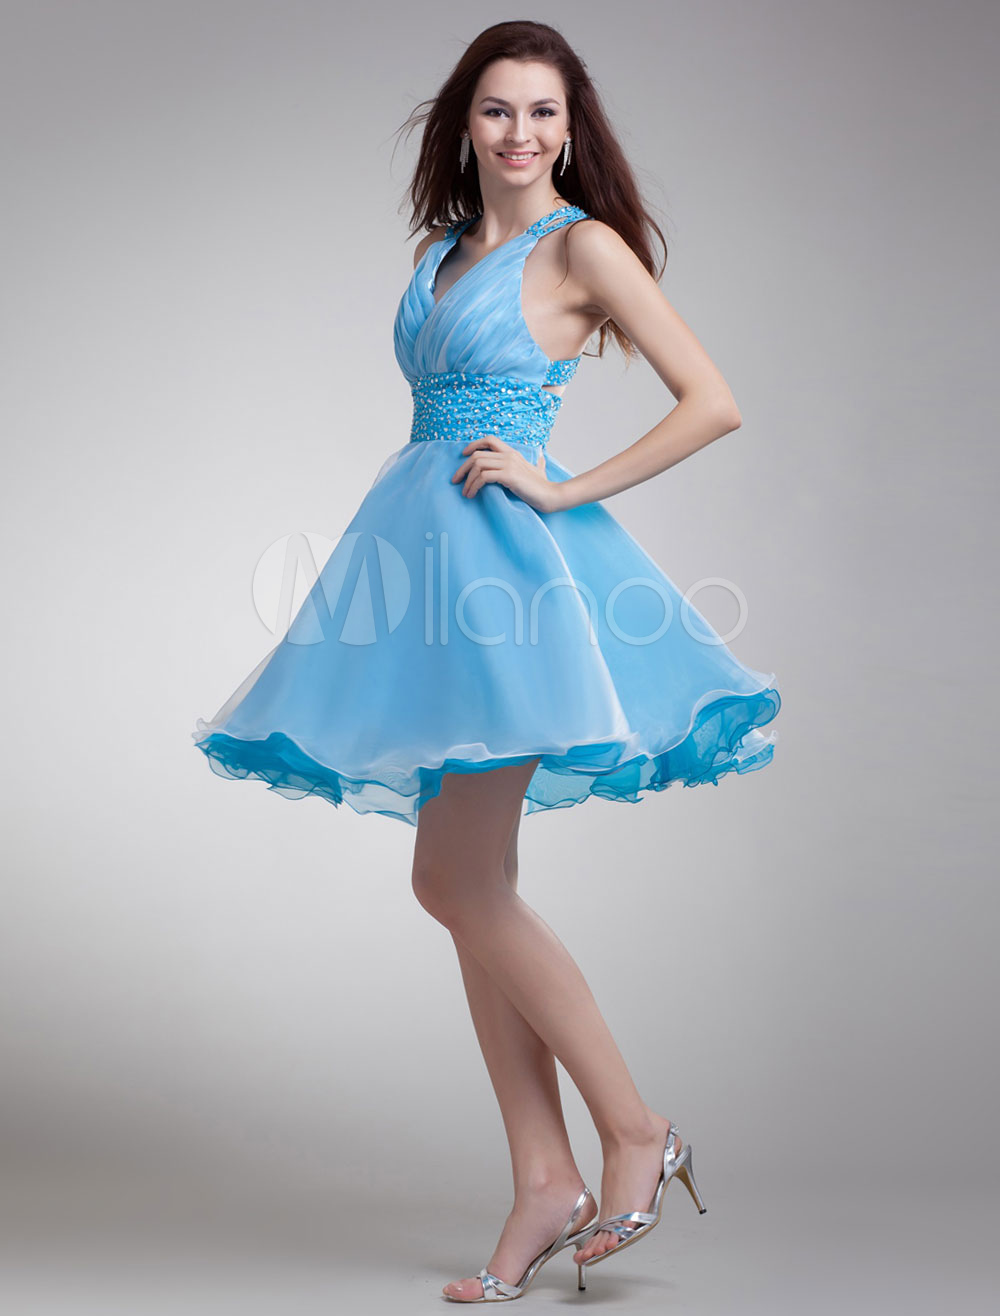 Short Prom Dress Criss-Cross Back Beading Organza Homecoming Dress Mini Party Dress